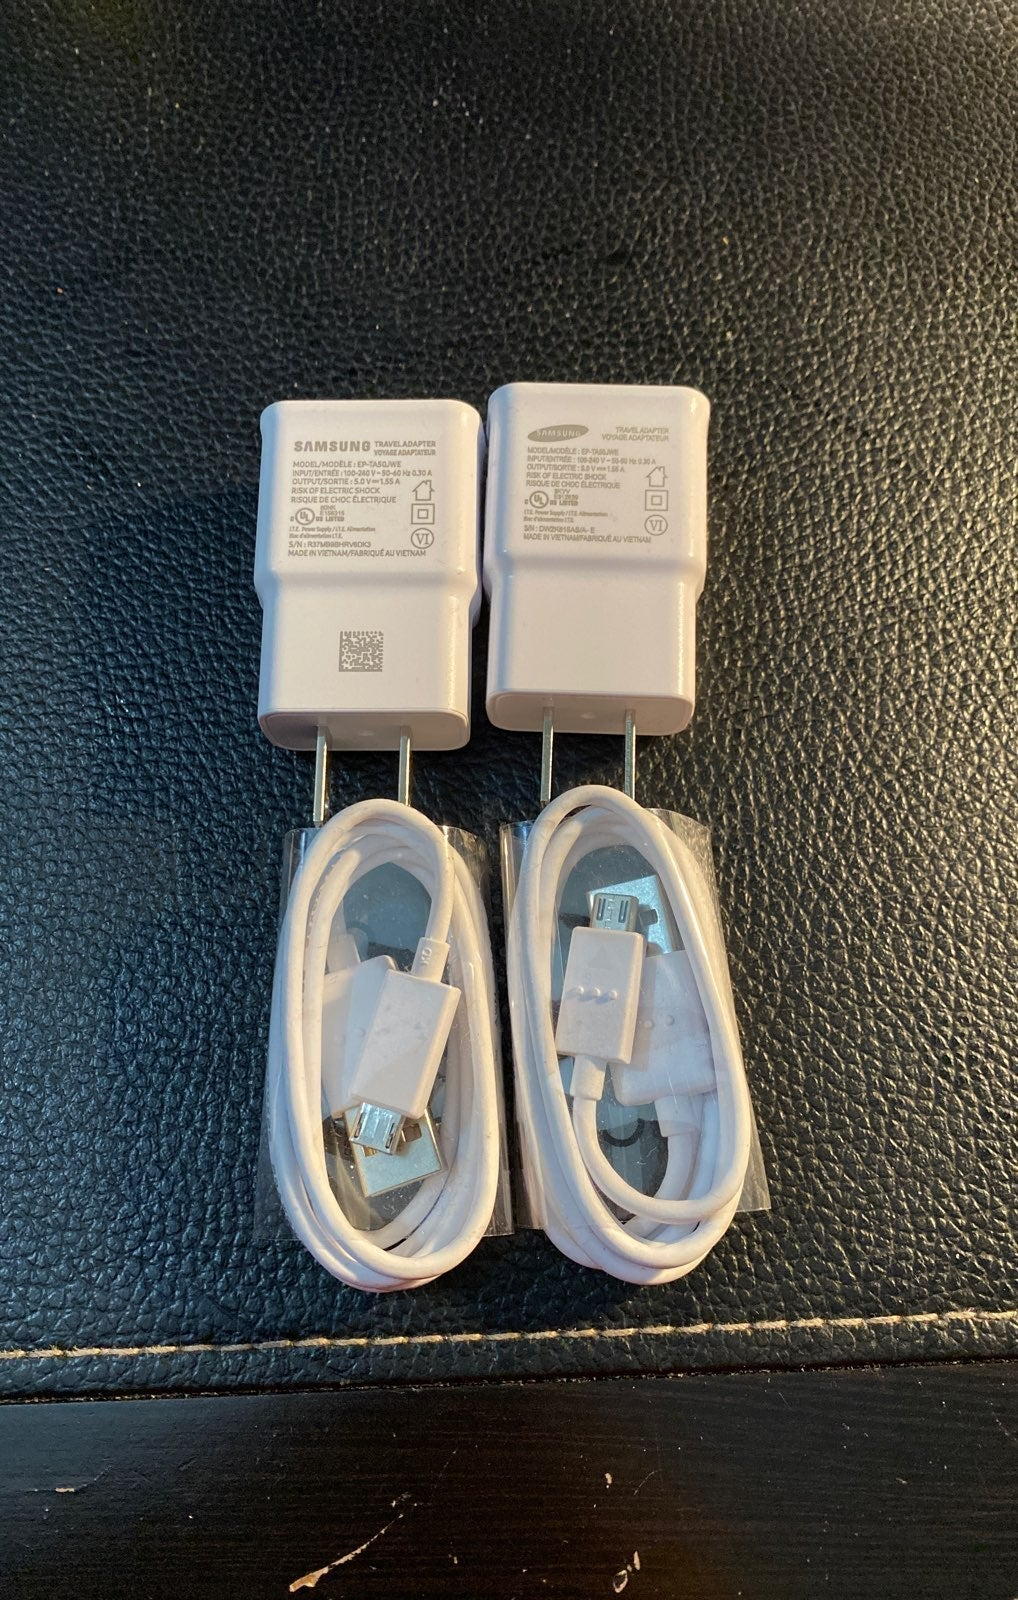 2x Samsung Travel Adapter w/ Micro-USB